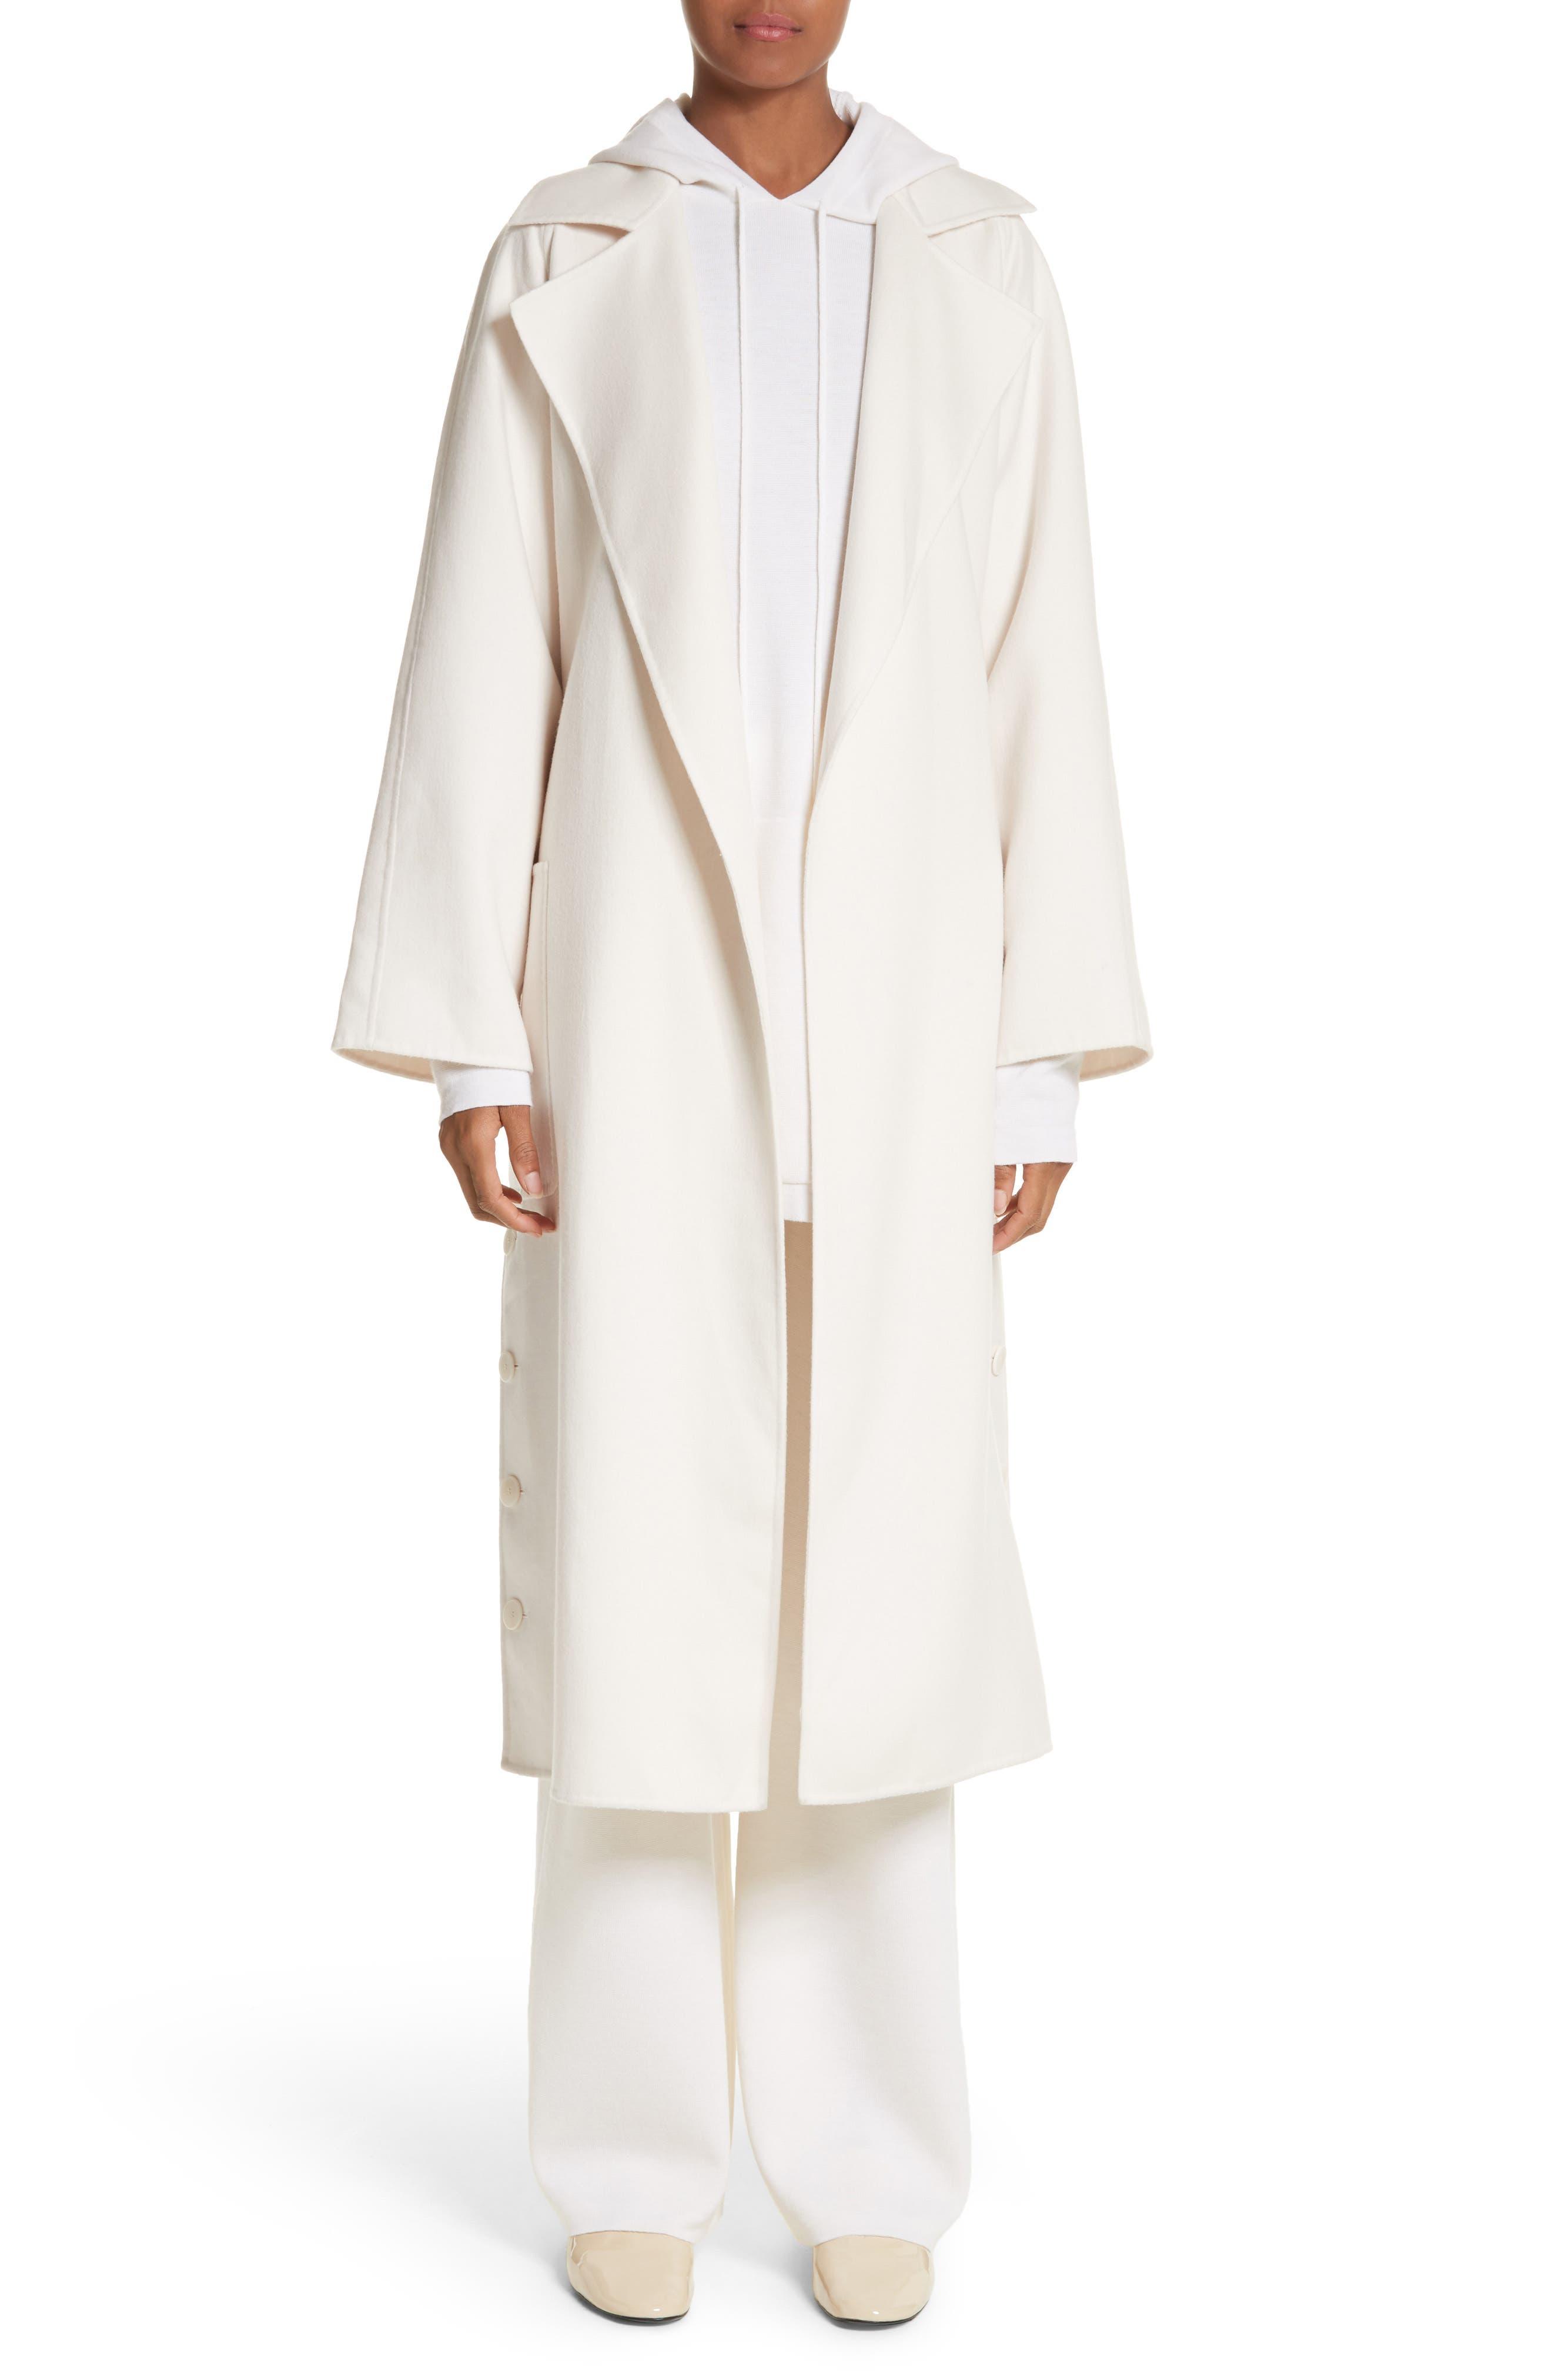 Main Image - Max Mara Alacre Wool & Cashmere Coat